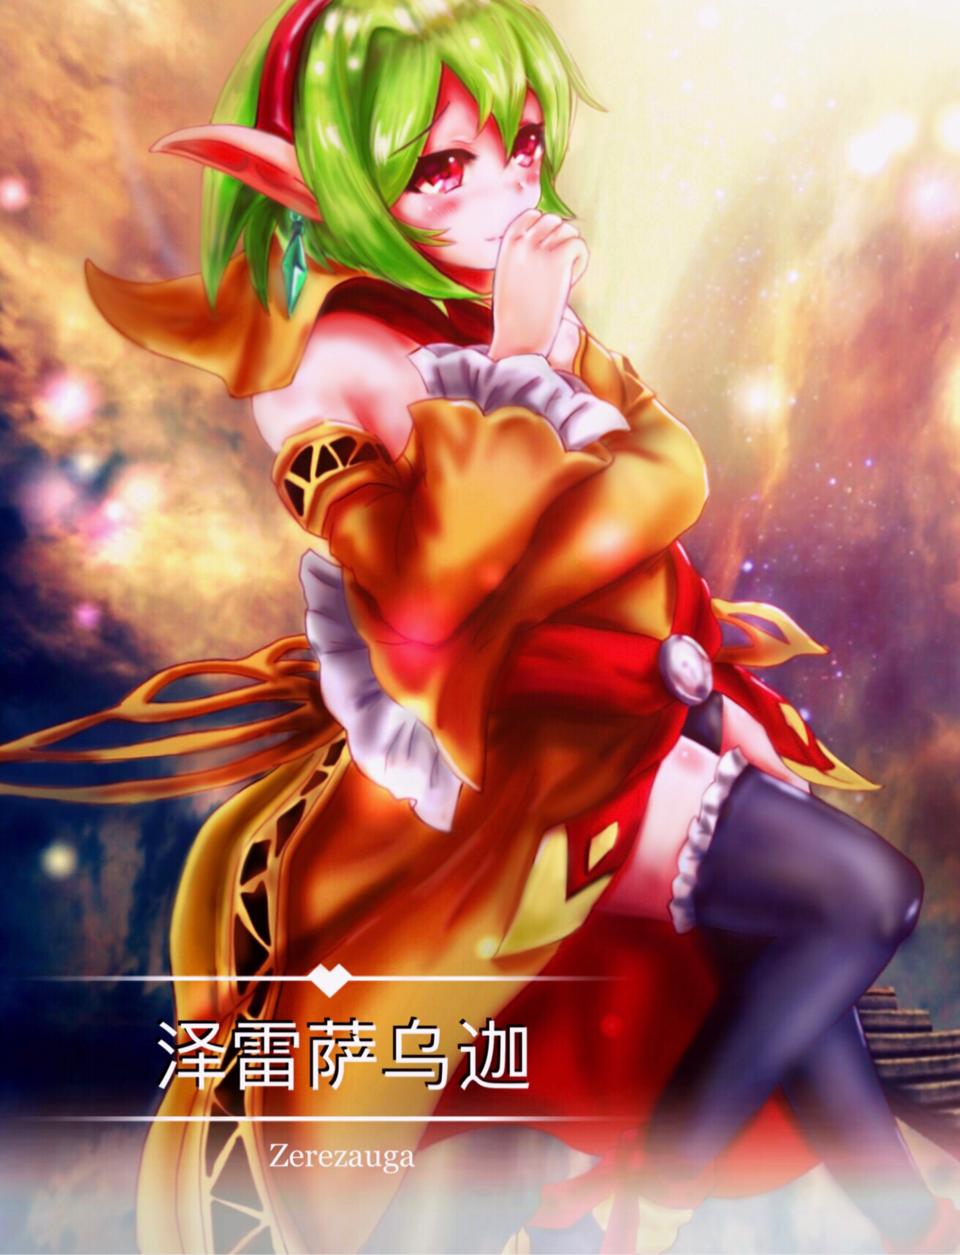 托兰异事录泽雷萨乌迦 Illust of 圣杯As 托兰异世录 RPG 托拉姆物语 characterdesign 泽雷萨乌迦